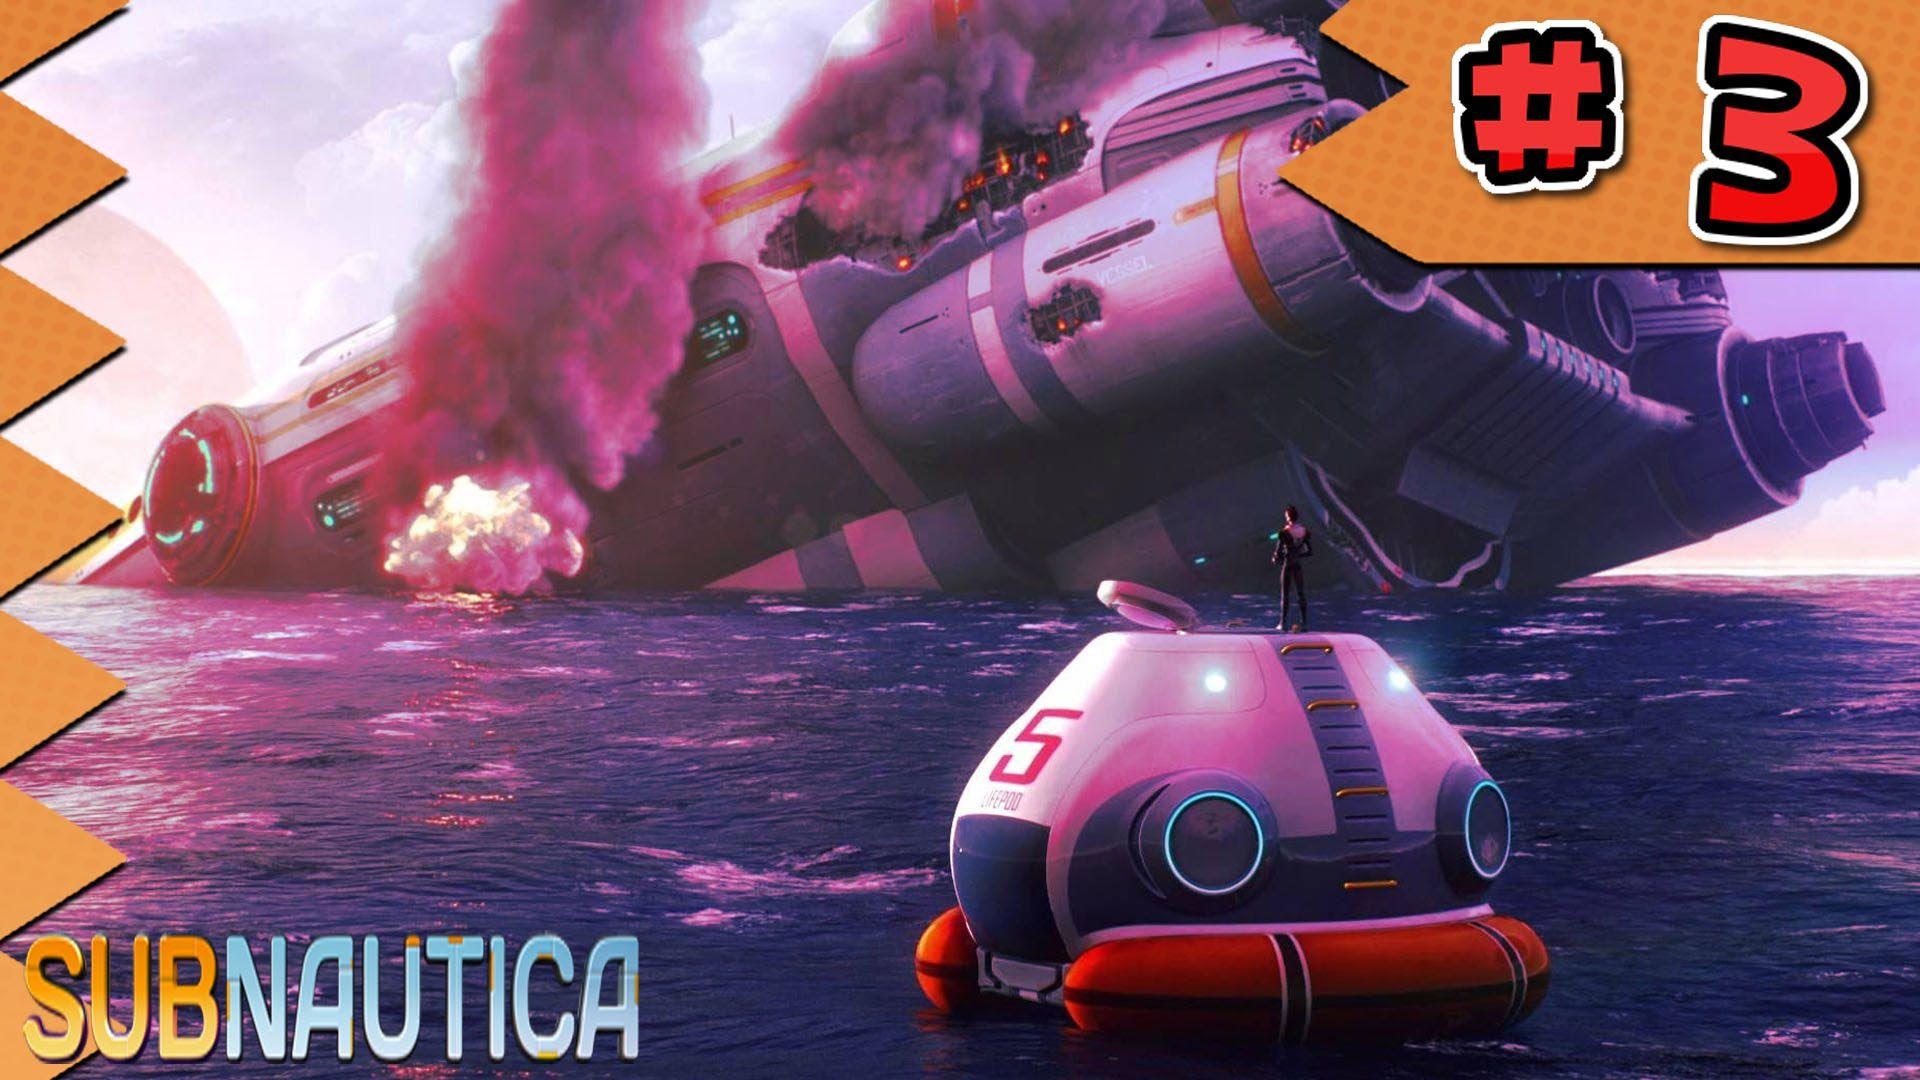 Subnautica Let's Play Ep 3: So many storage cubes - MyDiamondSkeleton!